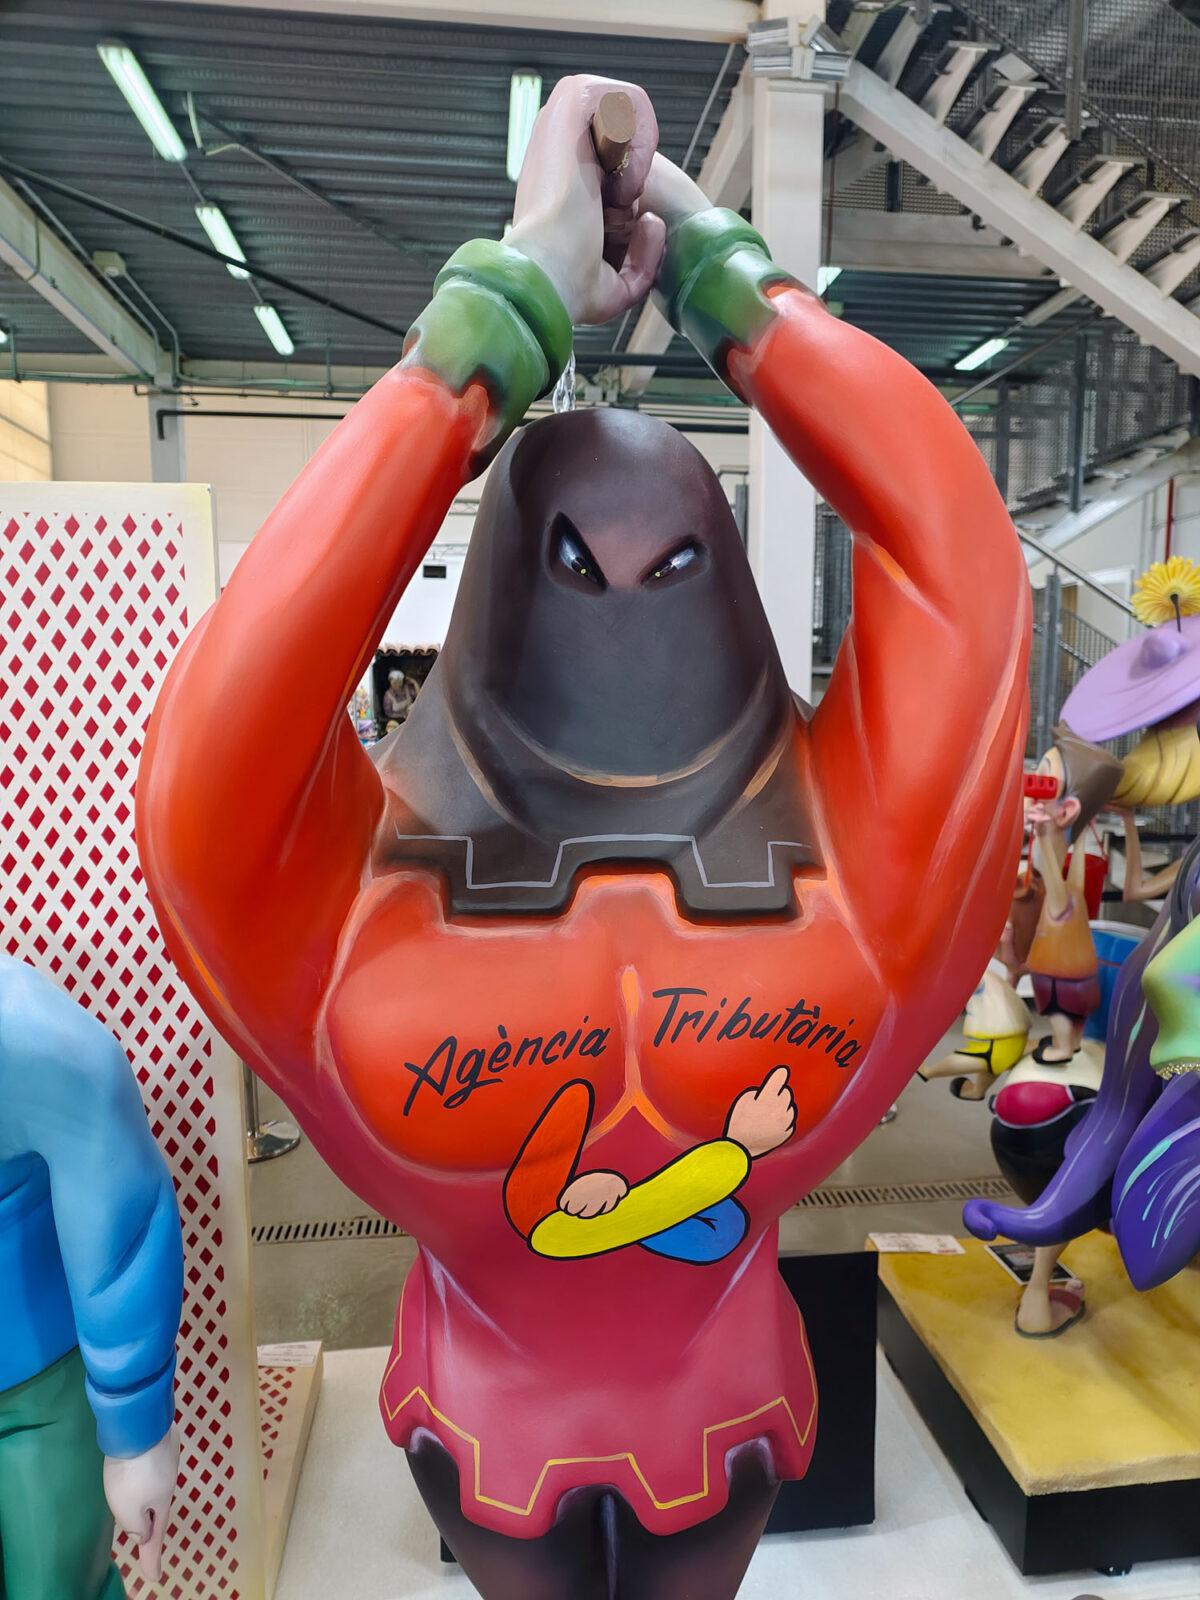 38 Exposicion Ninots Fallas 2021 IMG 20210723 183912